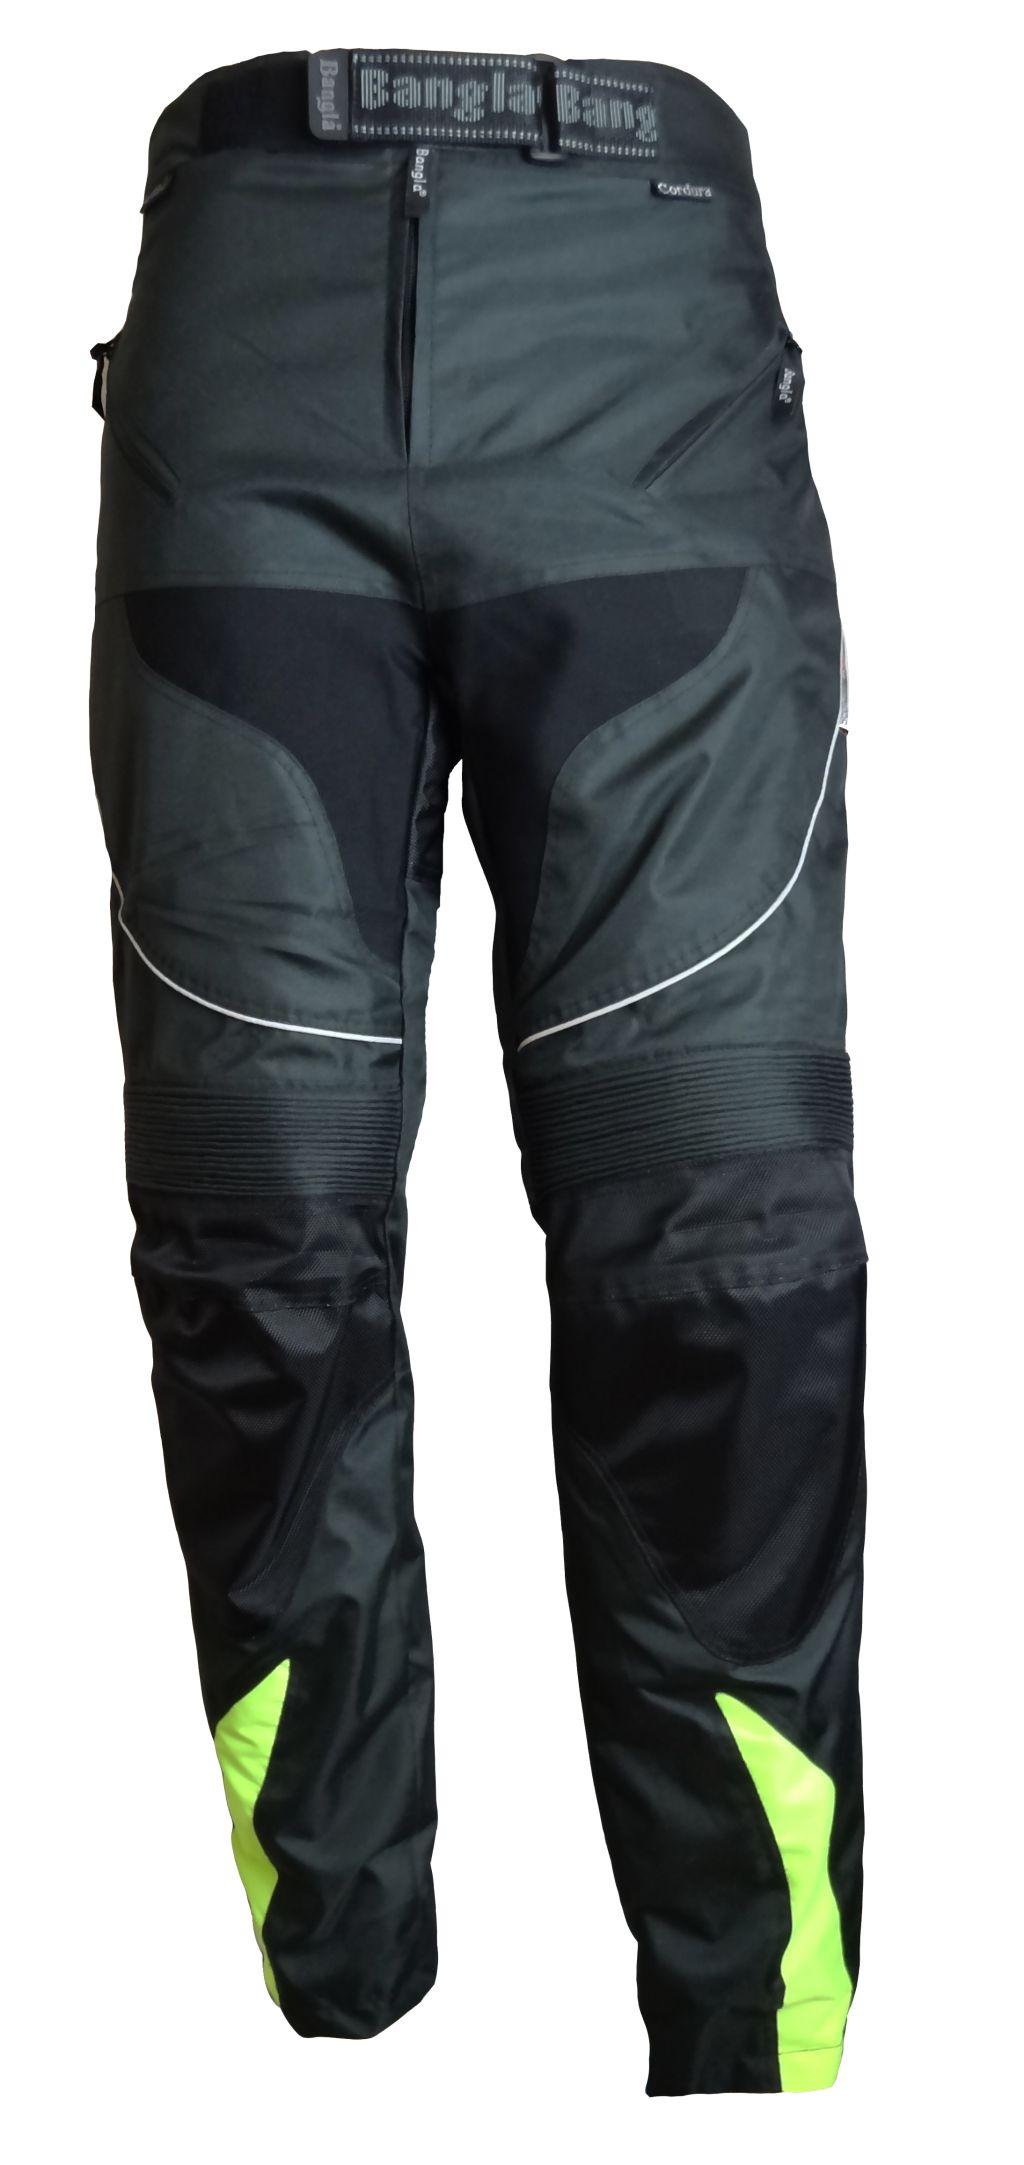 Kinder Motorrad Hose Cordura  Schwarz Kinderhose schwarz neongelb 128 - 176 Neu